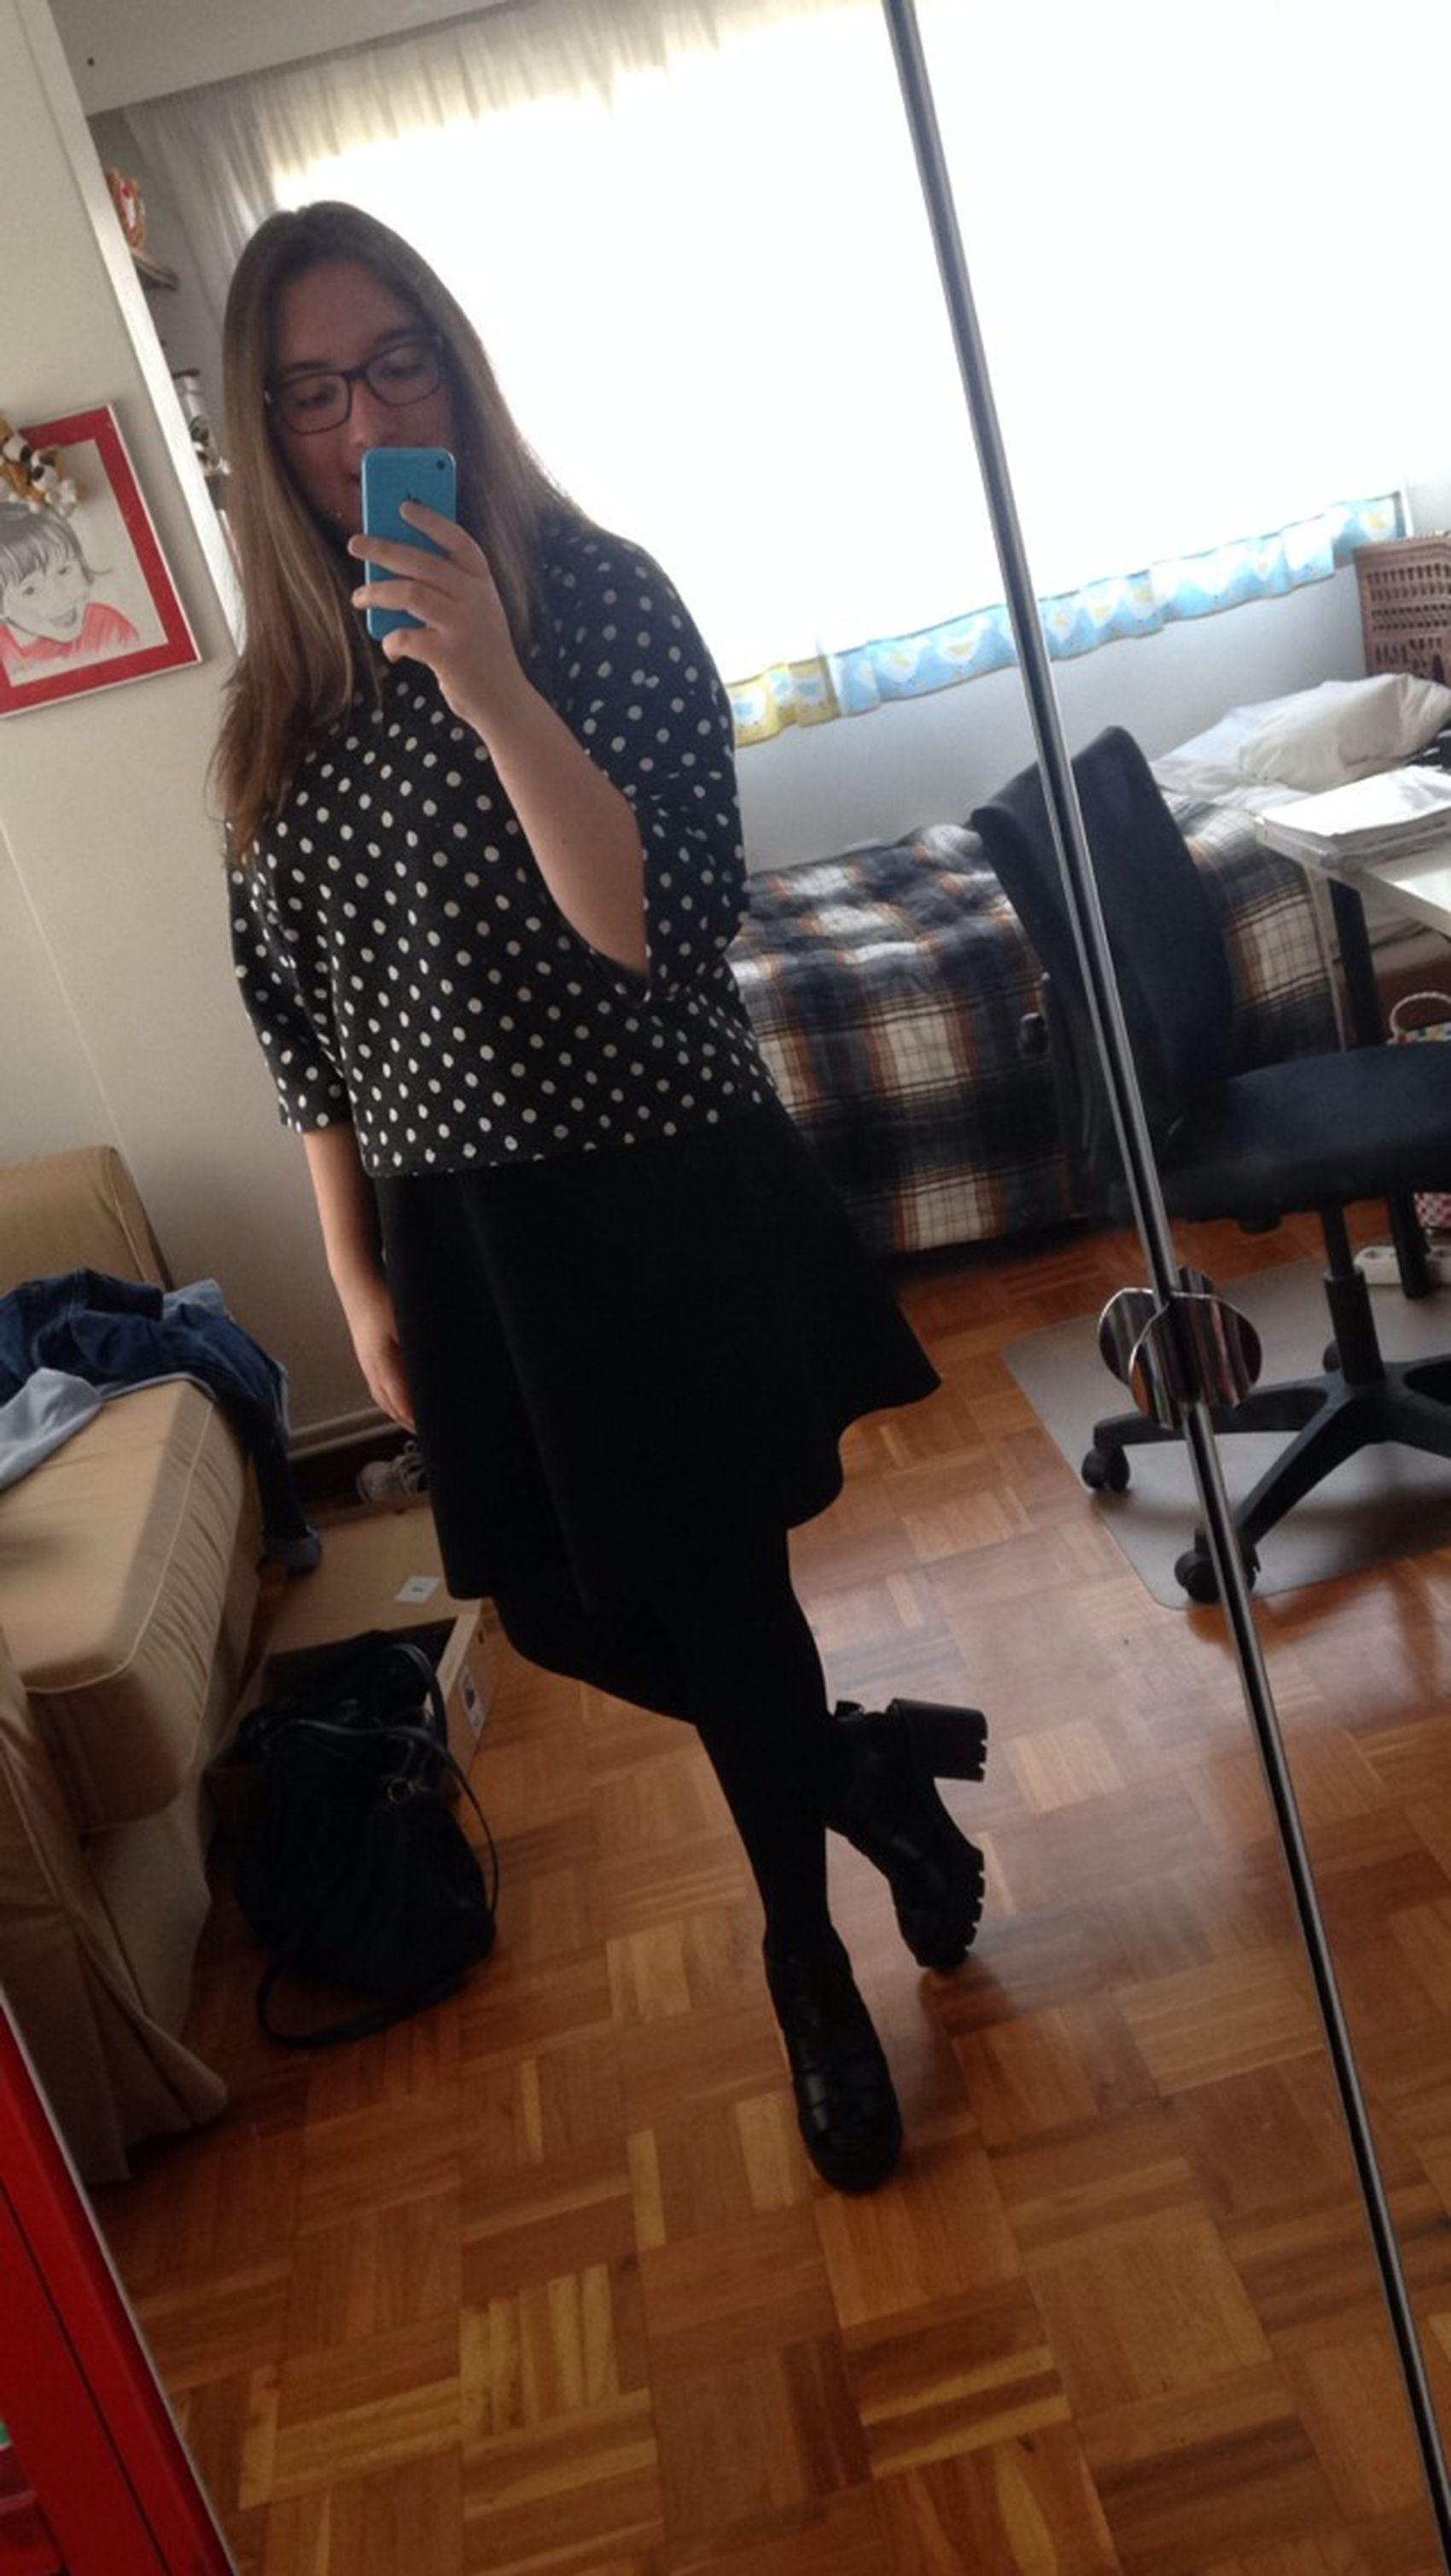 Graduation heels right there! 😍😍 Graduation Heels Graduation Here I Come! May Selfie